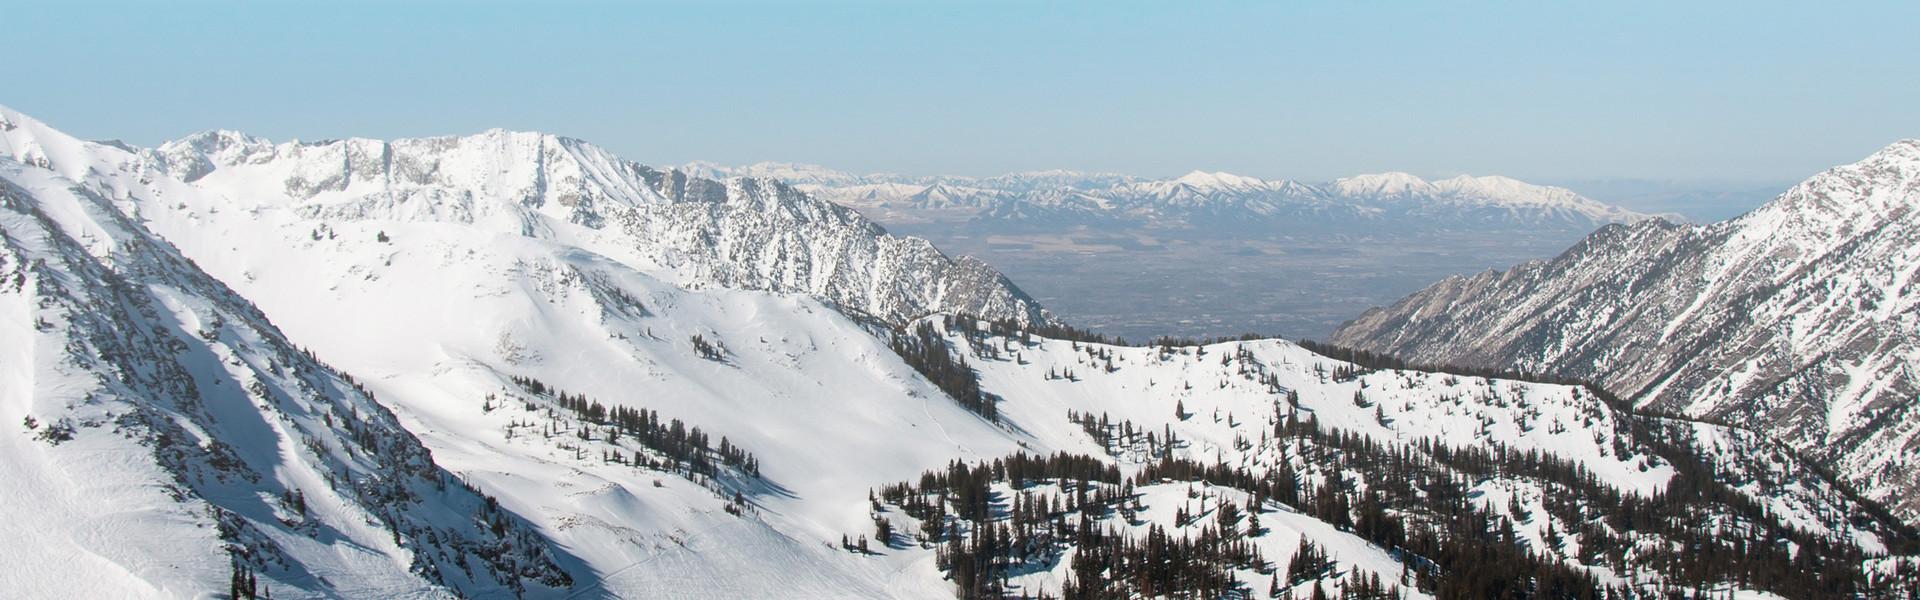 Park City, Utah Hotel and Ski Resort located near Canyons Village | Hot Air Ballooning